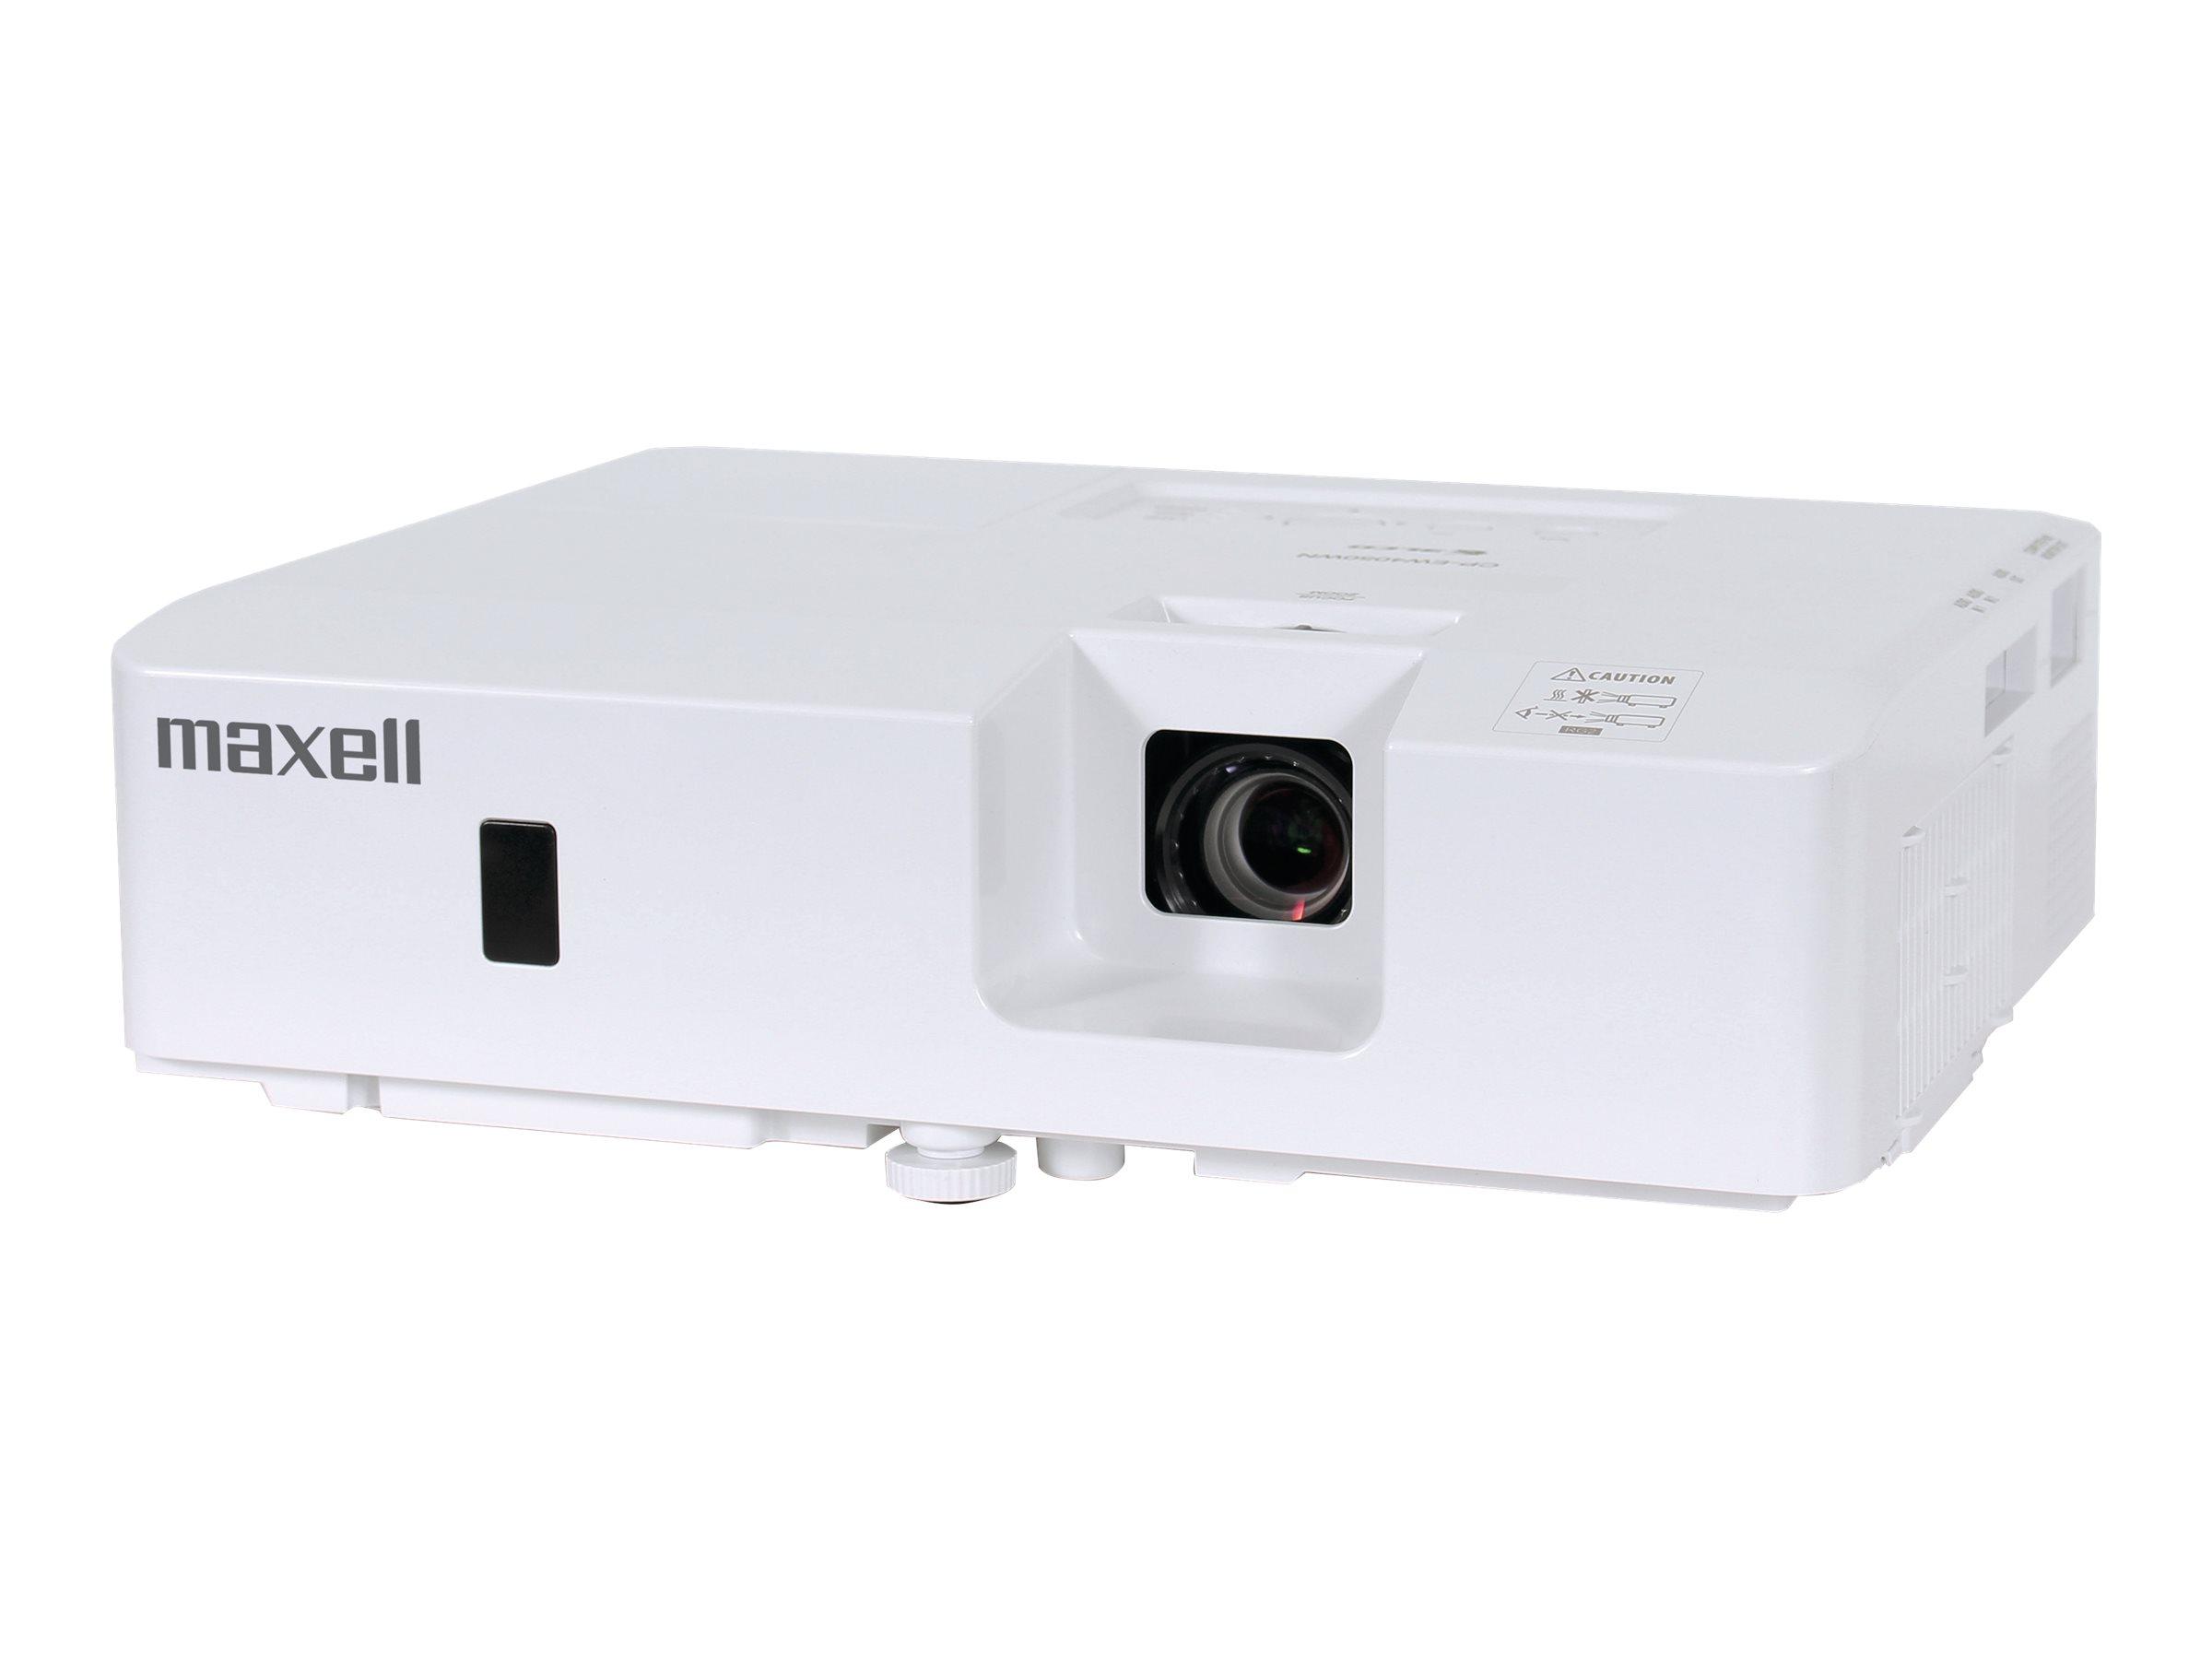 Maxell MC-EX3551 - 3LCD projector - LAN